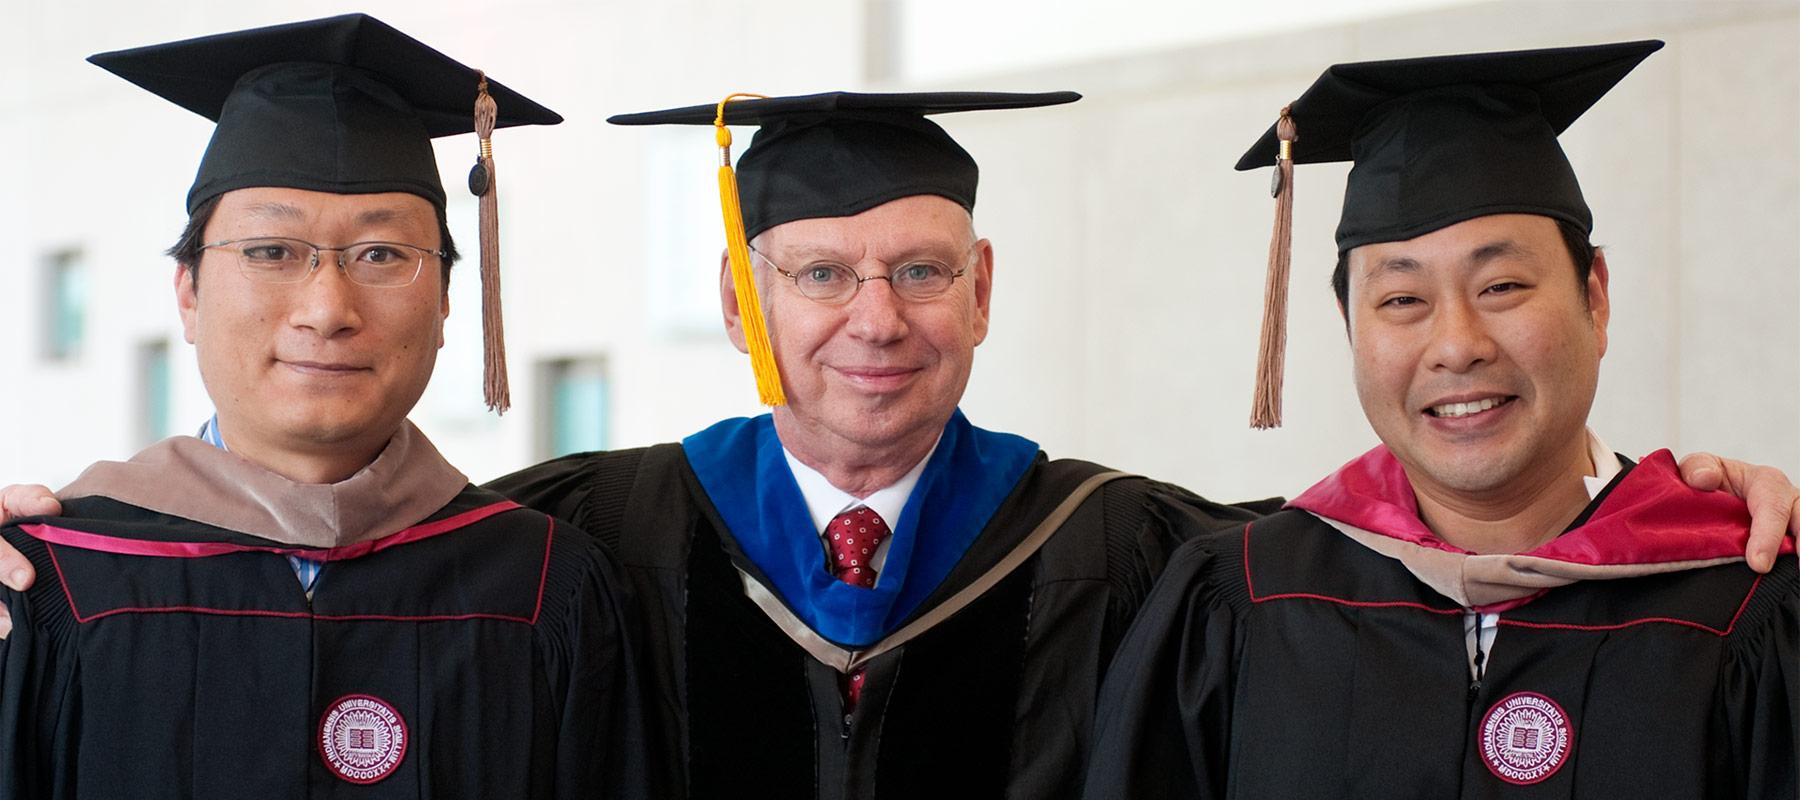 Graduation: Student Life: Executive Degree Programs: Programs ...